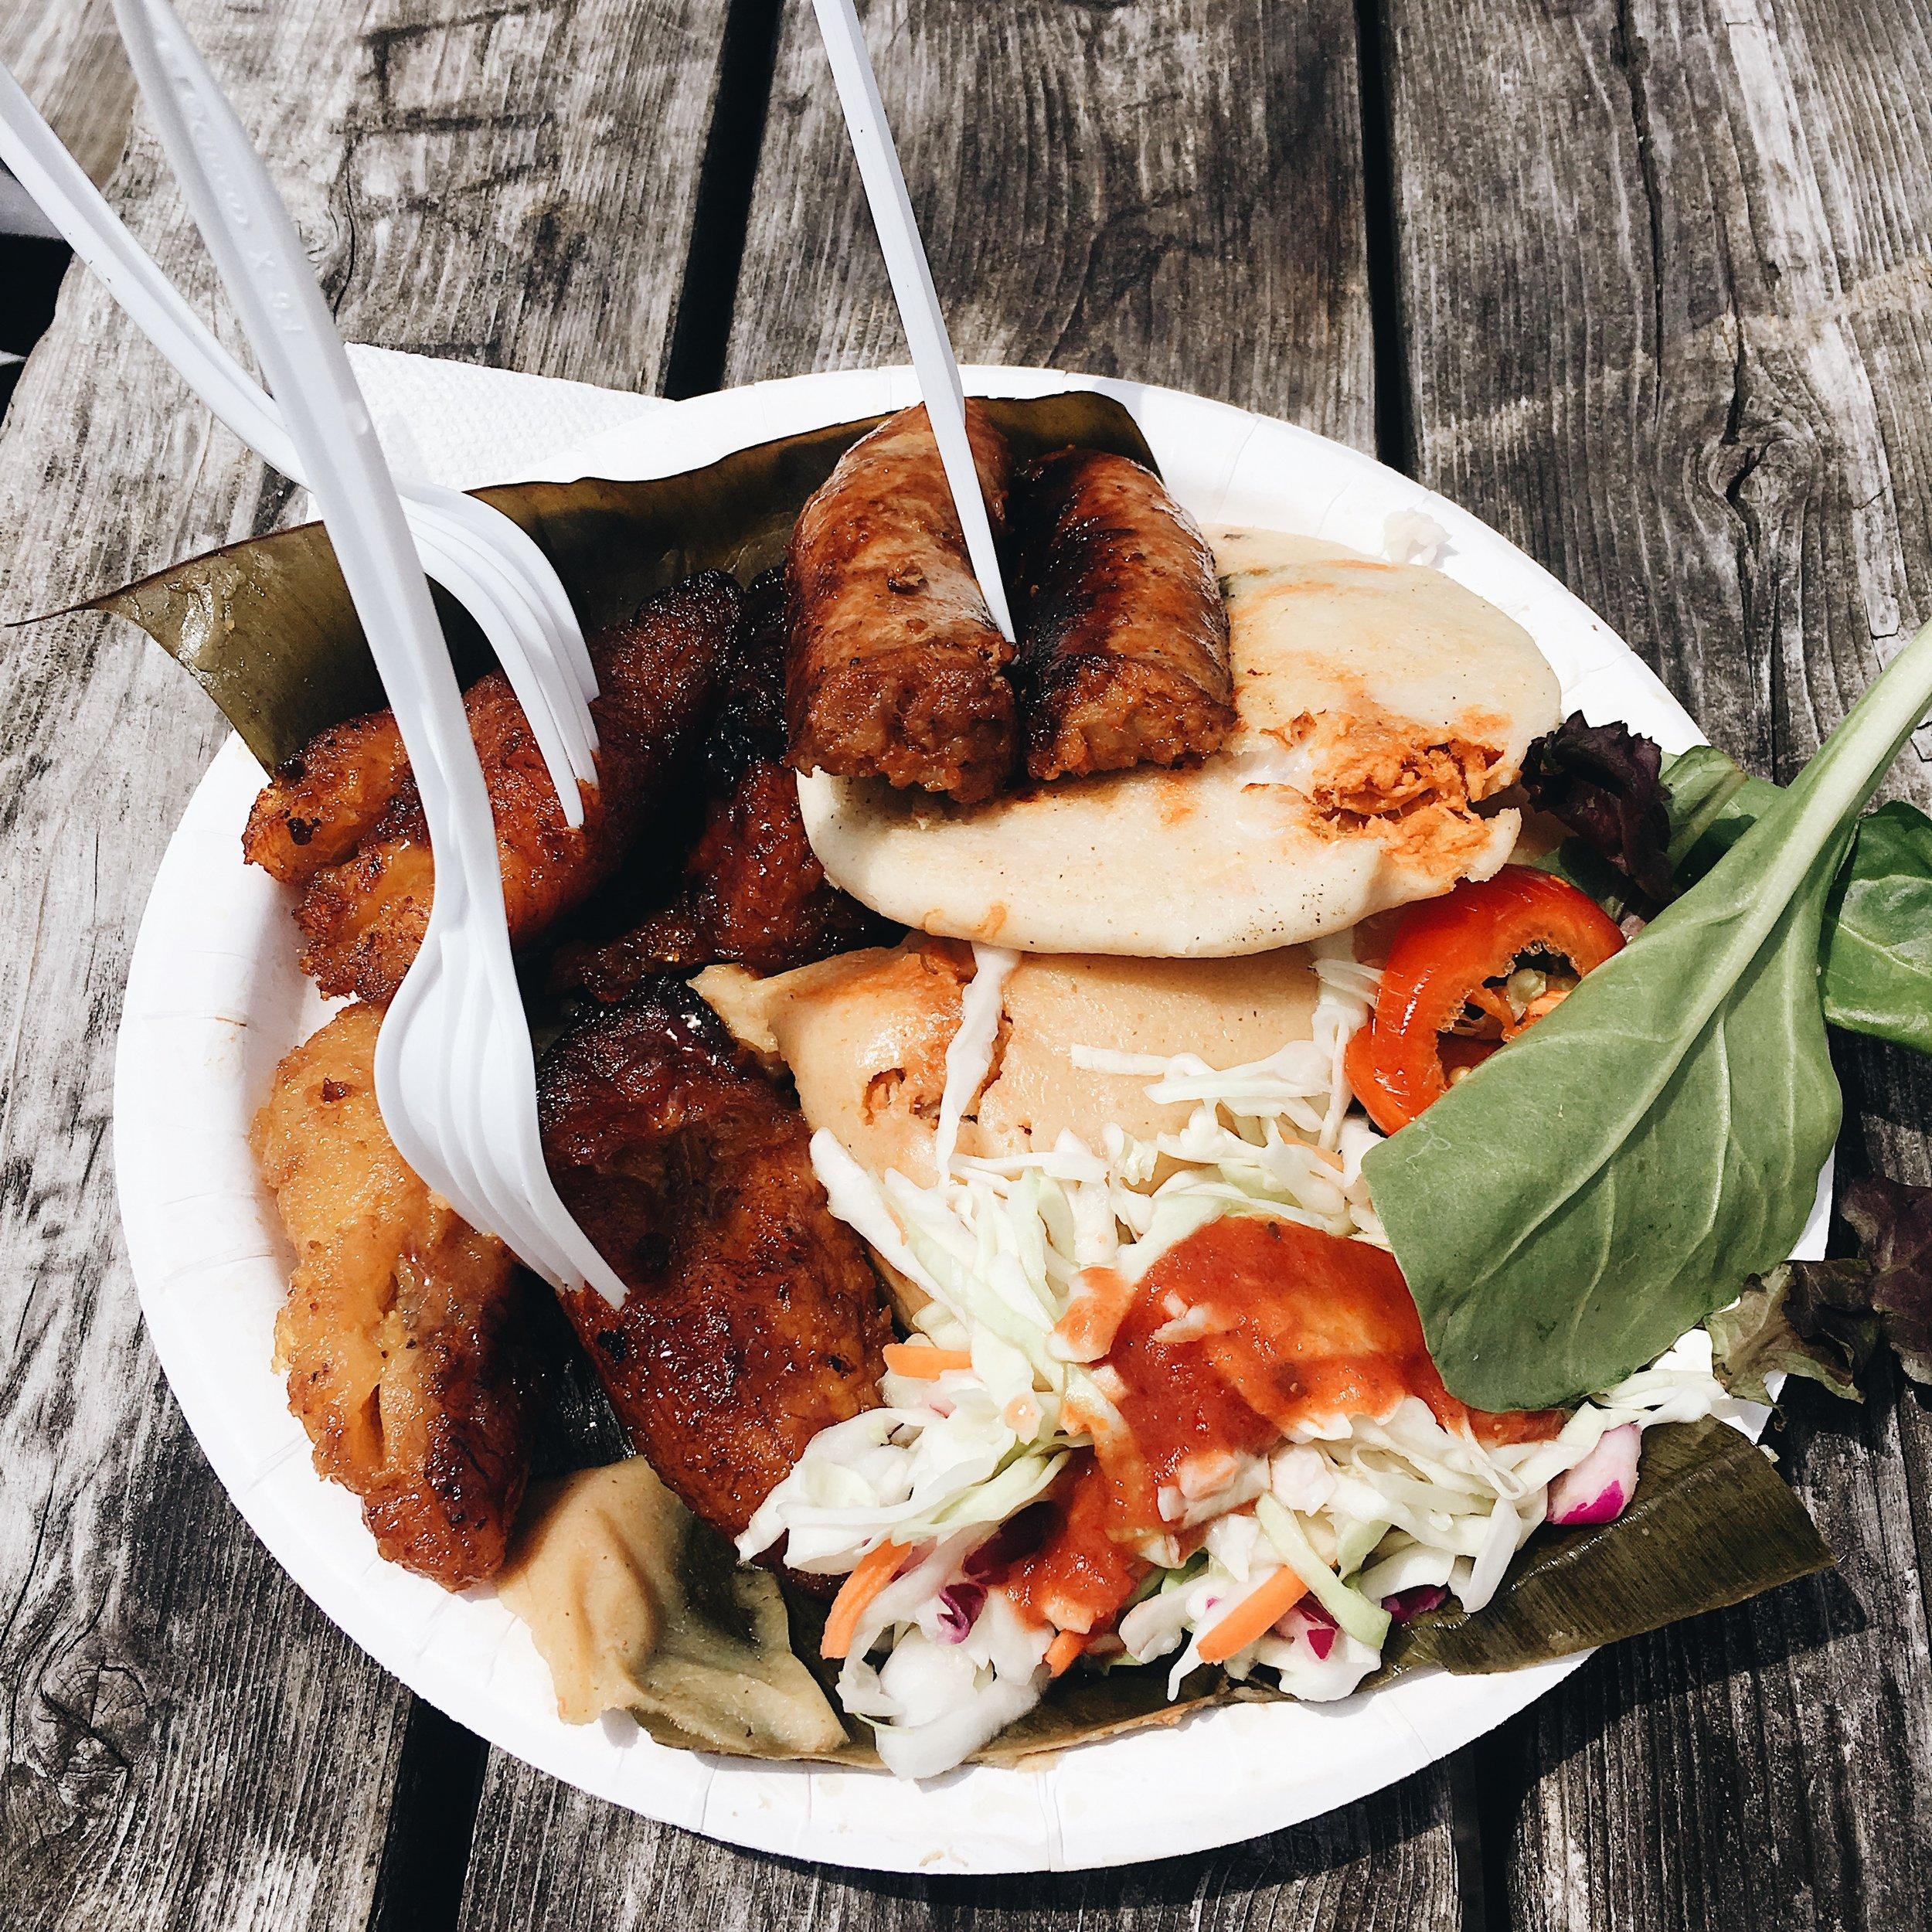 pupusa sampler platter-a salvadoran dish including pork tamale, chicken + cheese pupusa, chorizo, plantains, peppers and coleslaw!